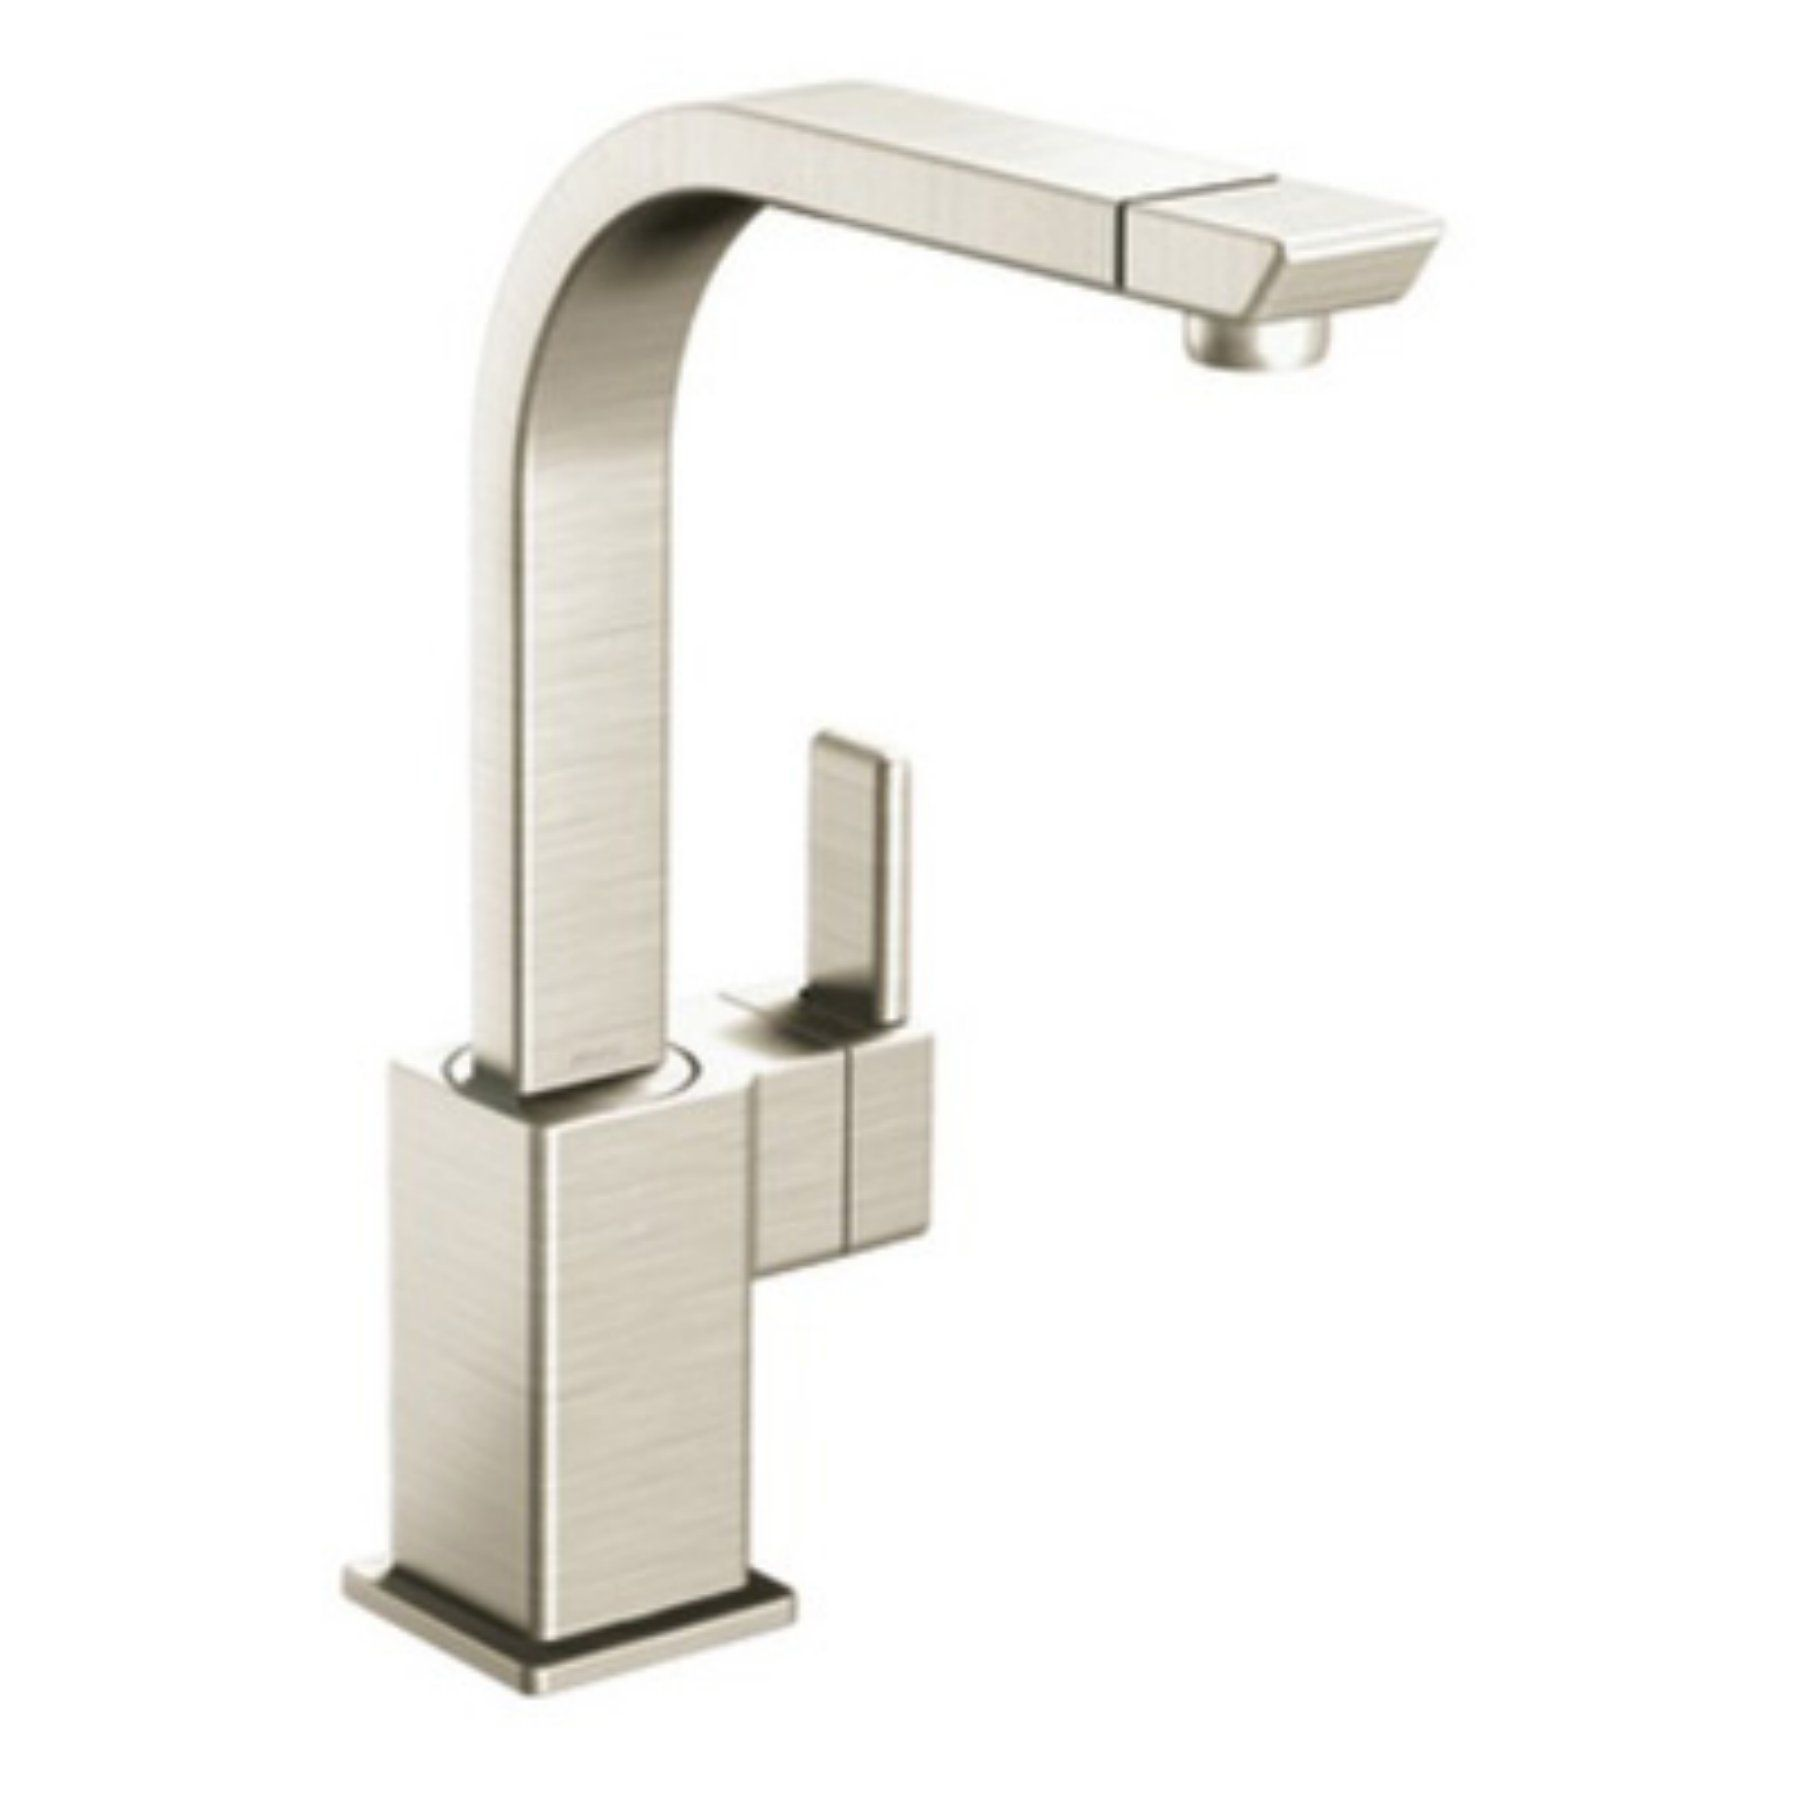 Moen 90 Degree S7170 Single Handle Kitchen Faucet - MS7170